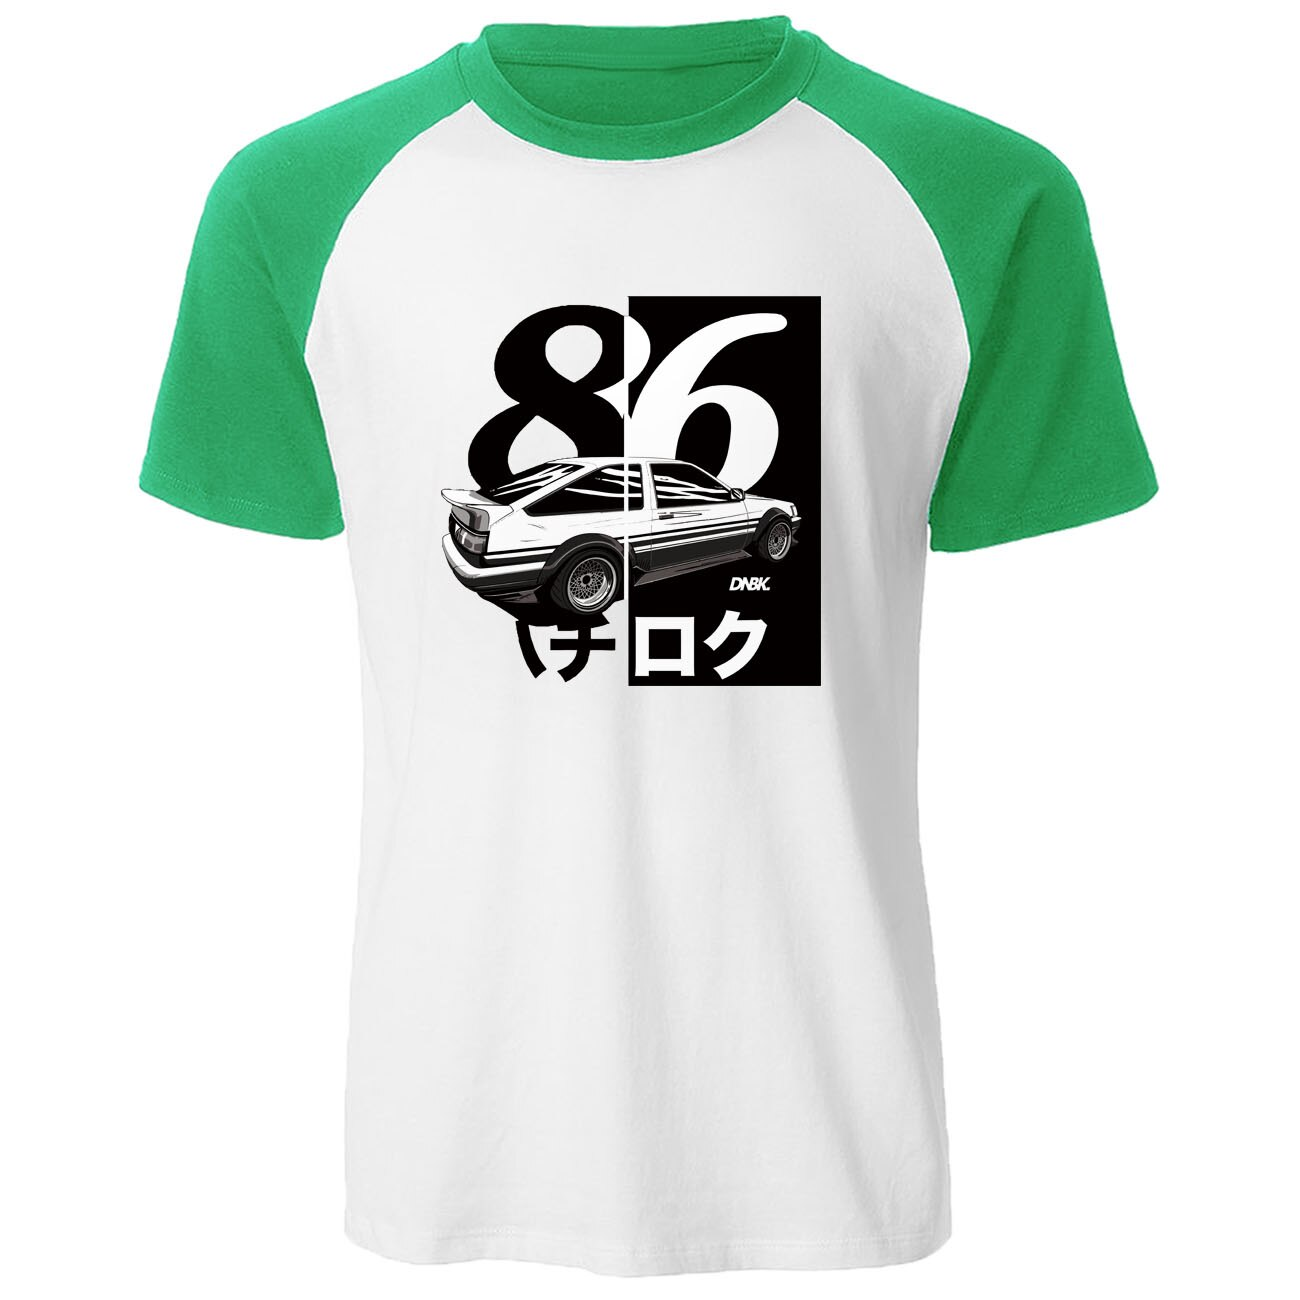 Los hombres de impresión camiseta Drift Anime japonés de moda camisa de manga corta raglán O cuello de verano Casual AE86 inicial D Homme camiseta